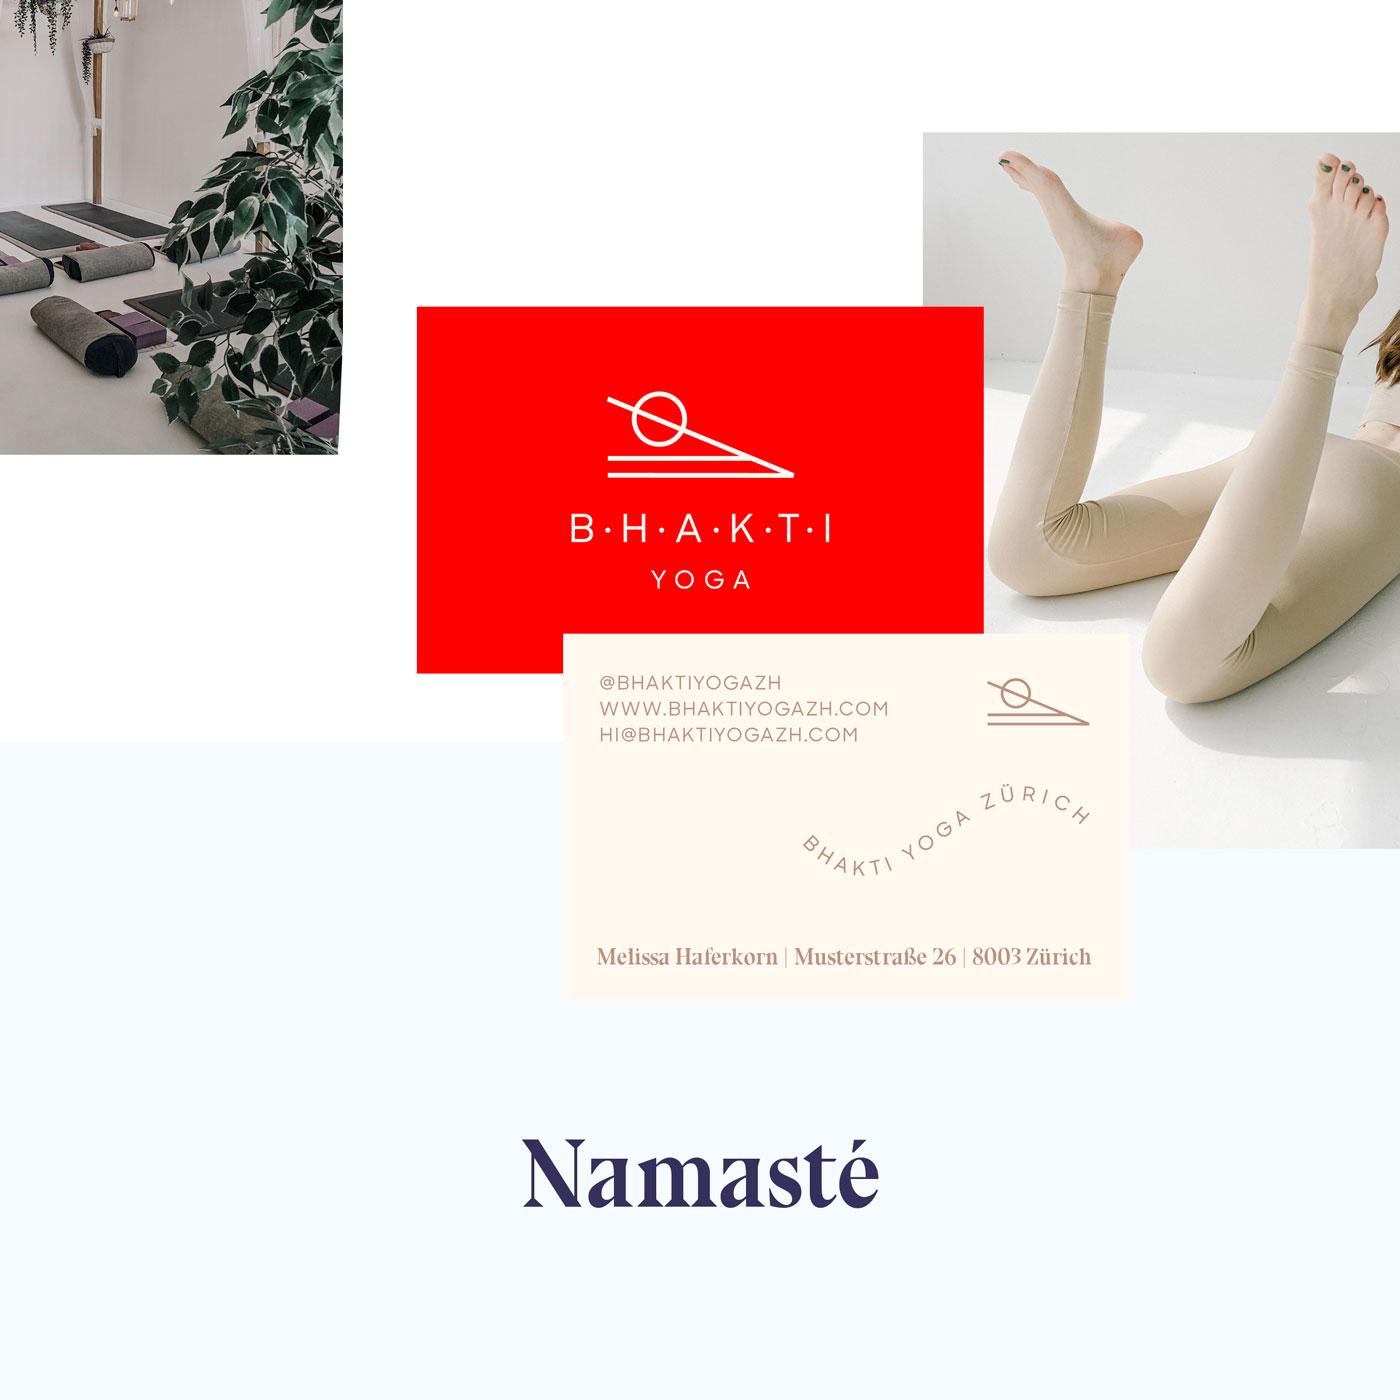 Bhakti Yoga Brand Identity + Business Card by Mindt